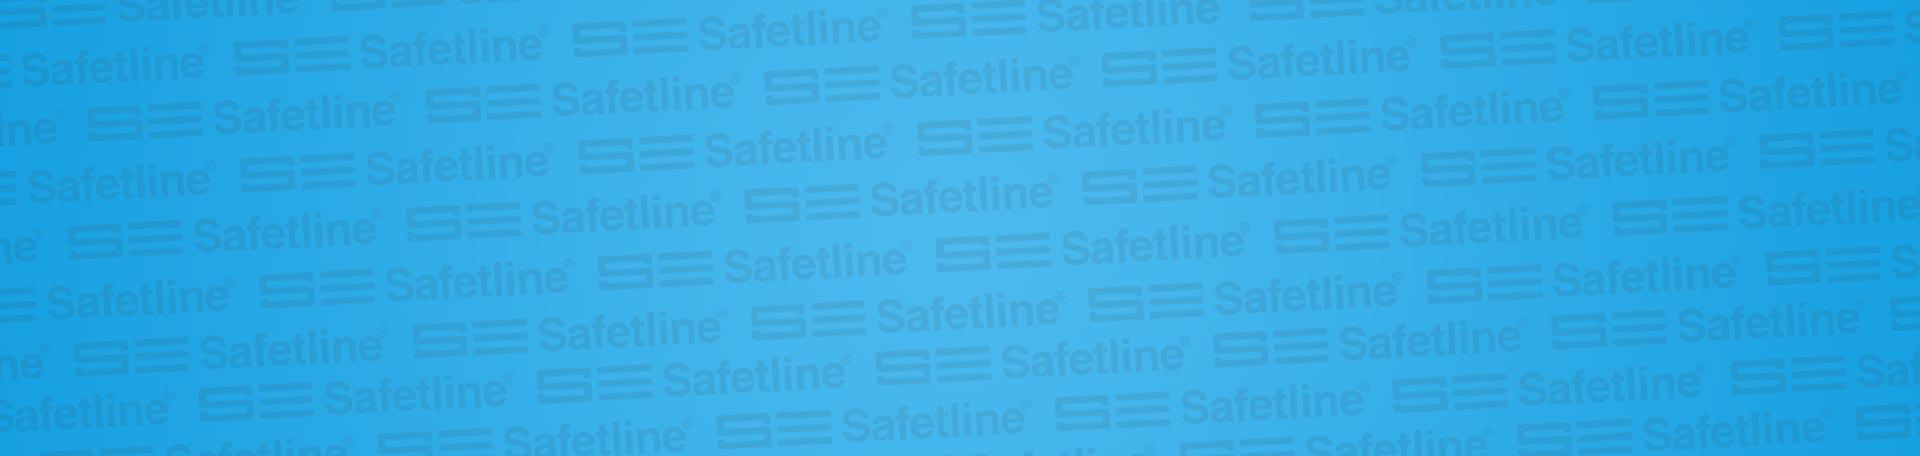 Tecnologias Safetline